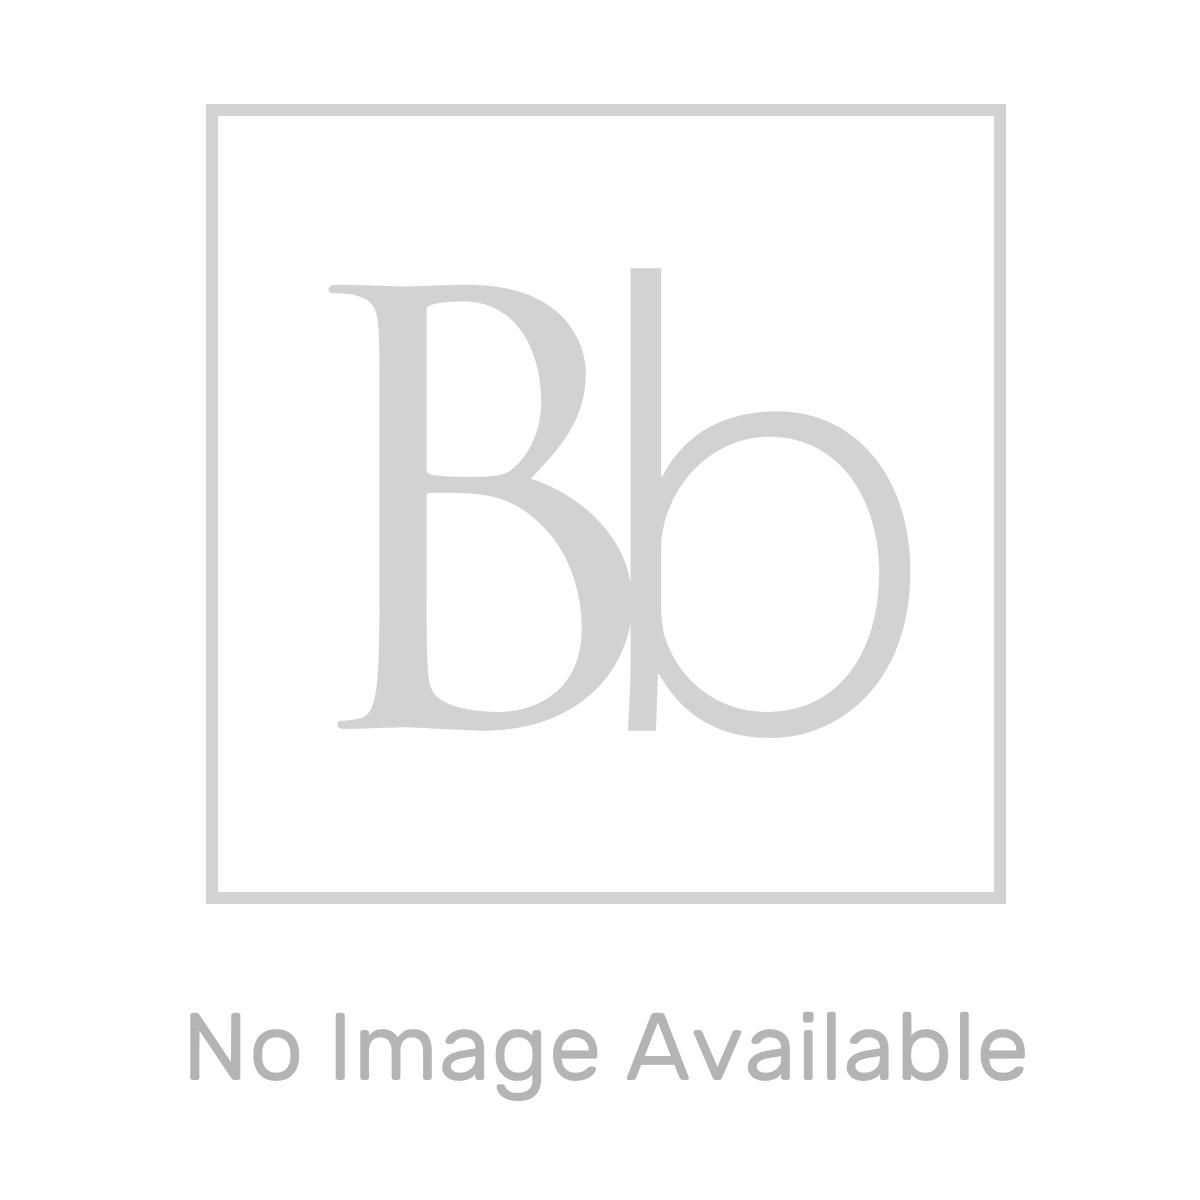 Elation Eko Dijon Walnut Tall Unit with Slab Door 1500mm